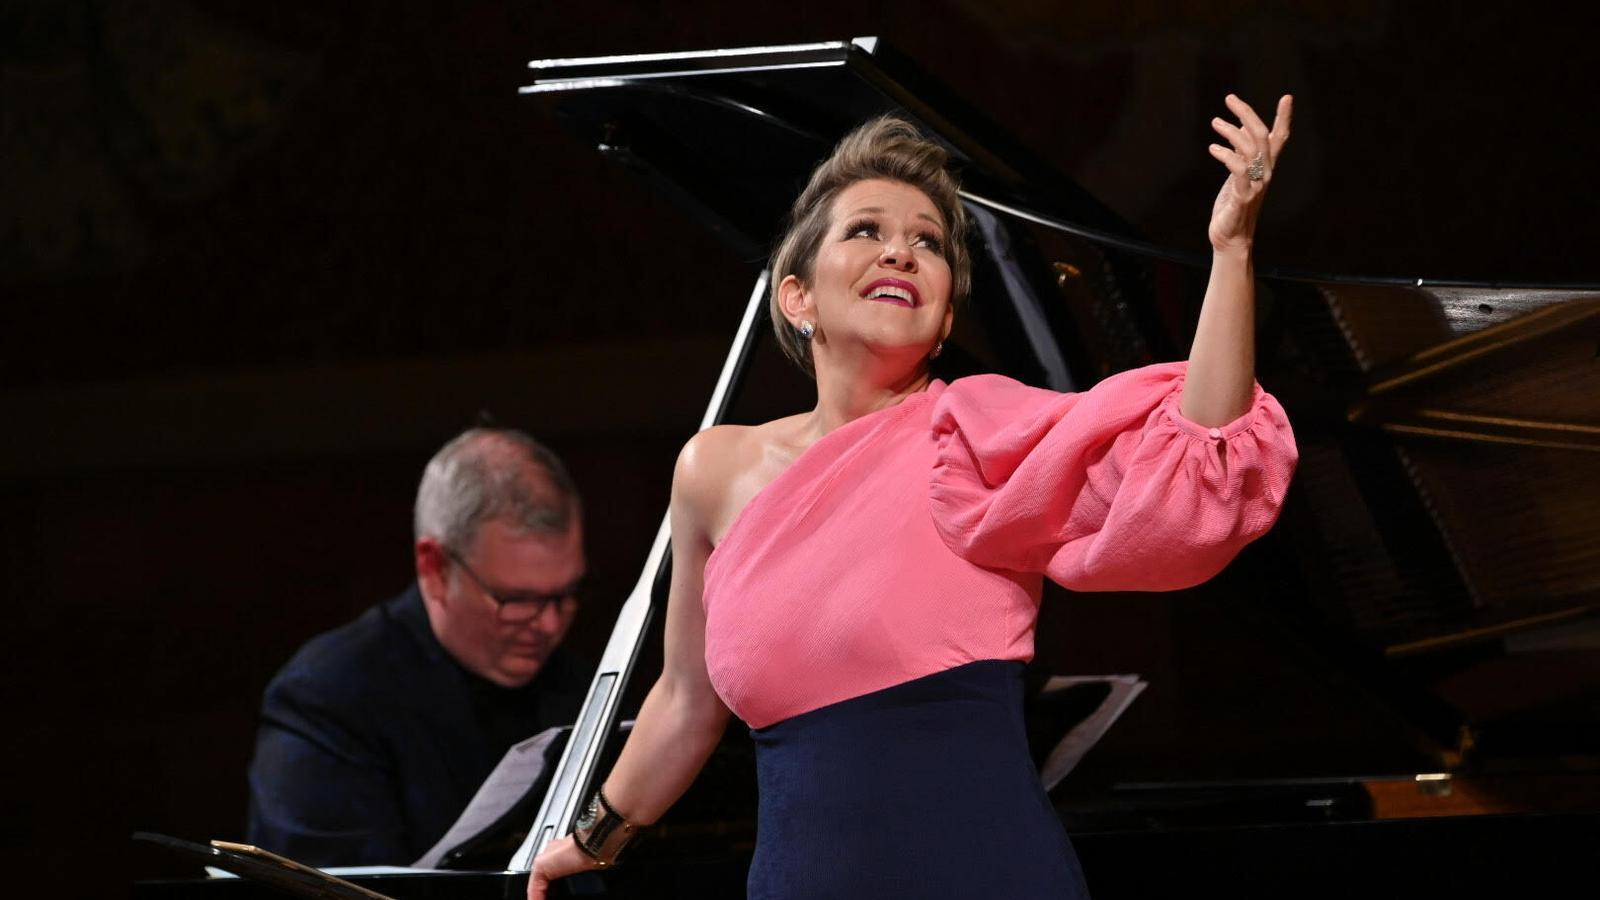 Joyce DiDonato durant el recital al Palau de la Música